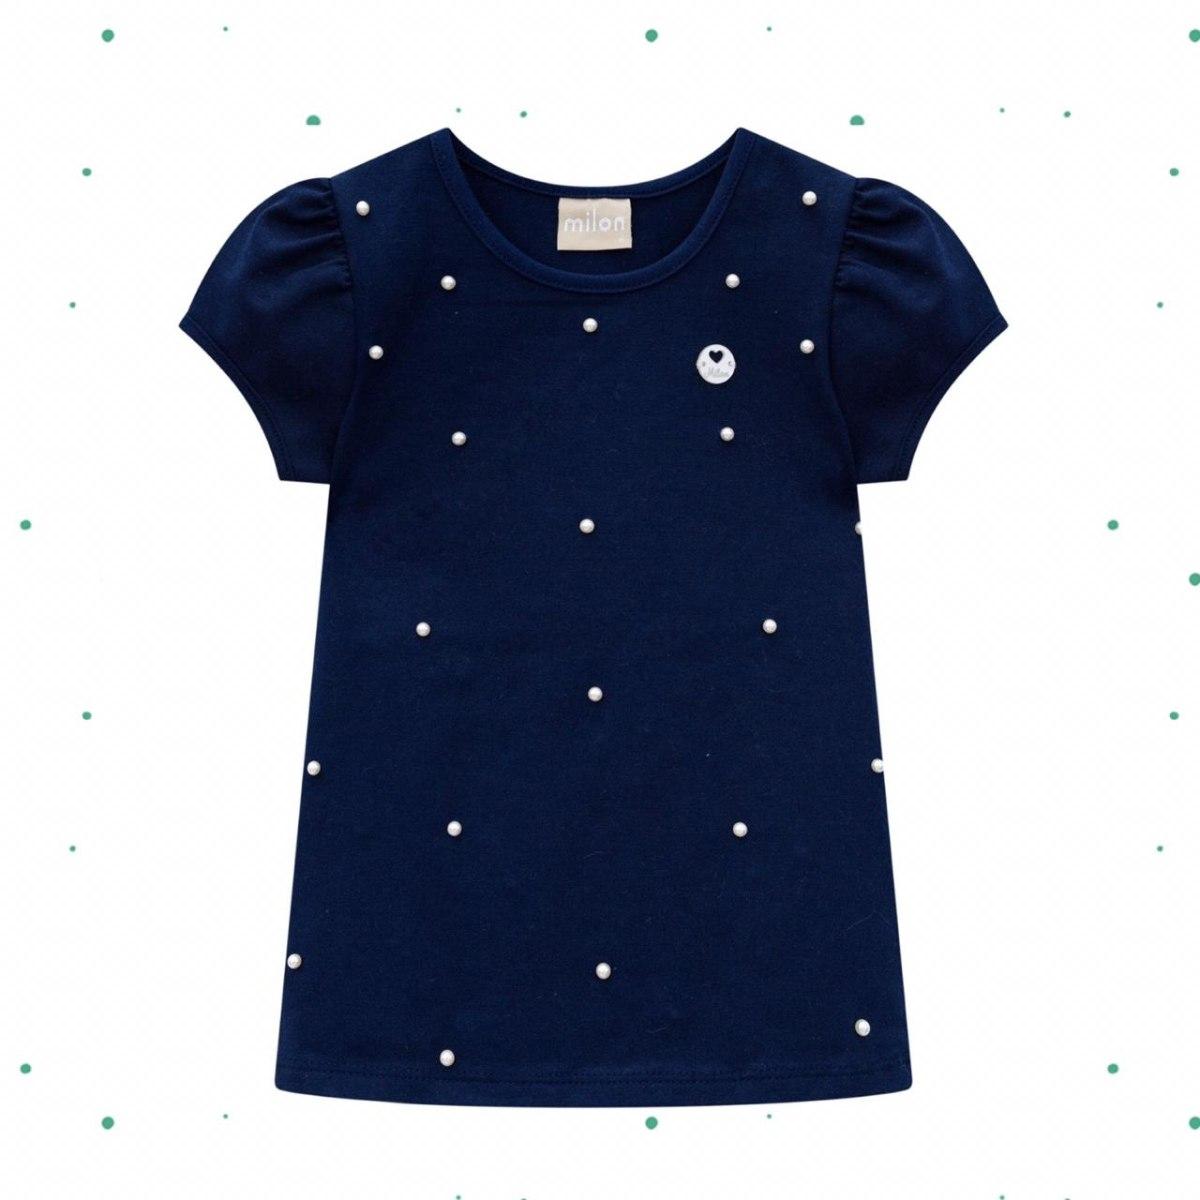 Blusa Menina Milon em Cotton Azul Marinho